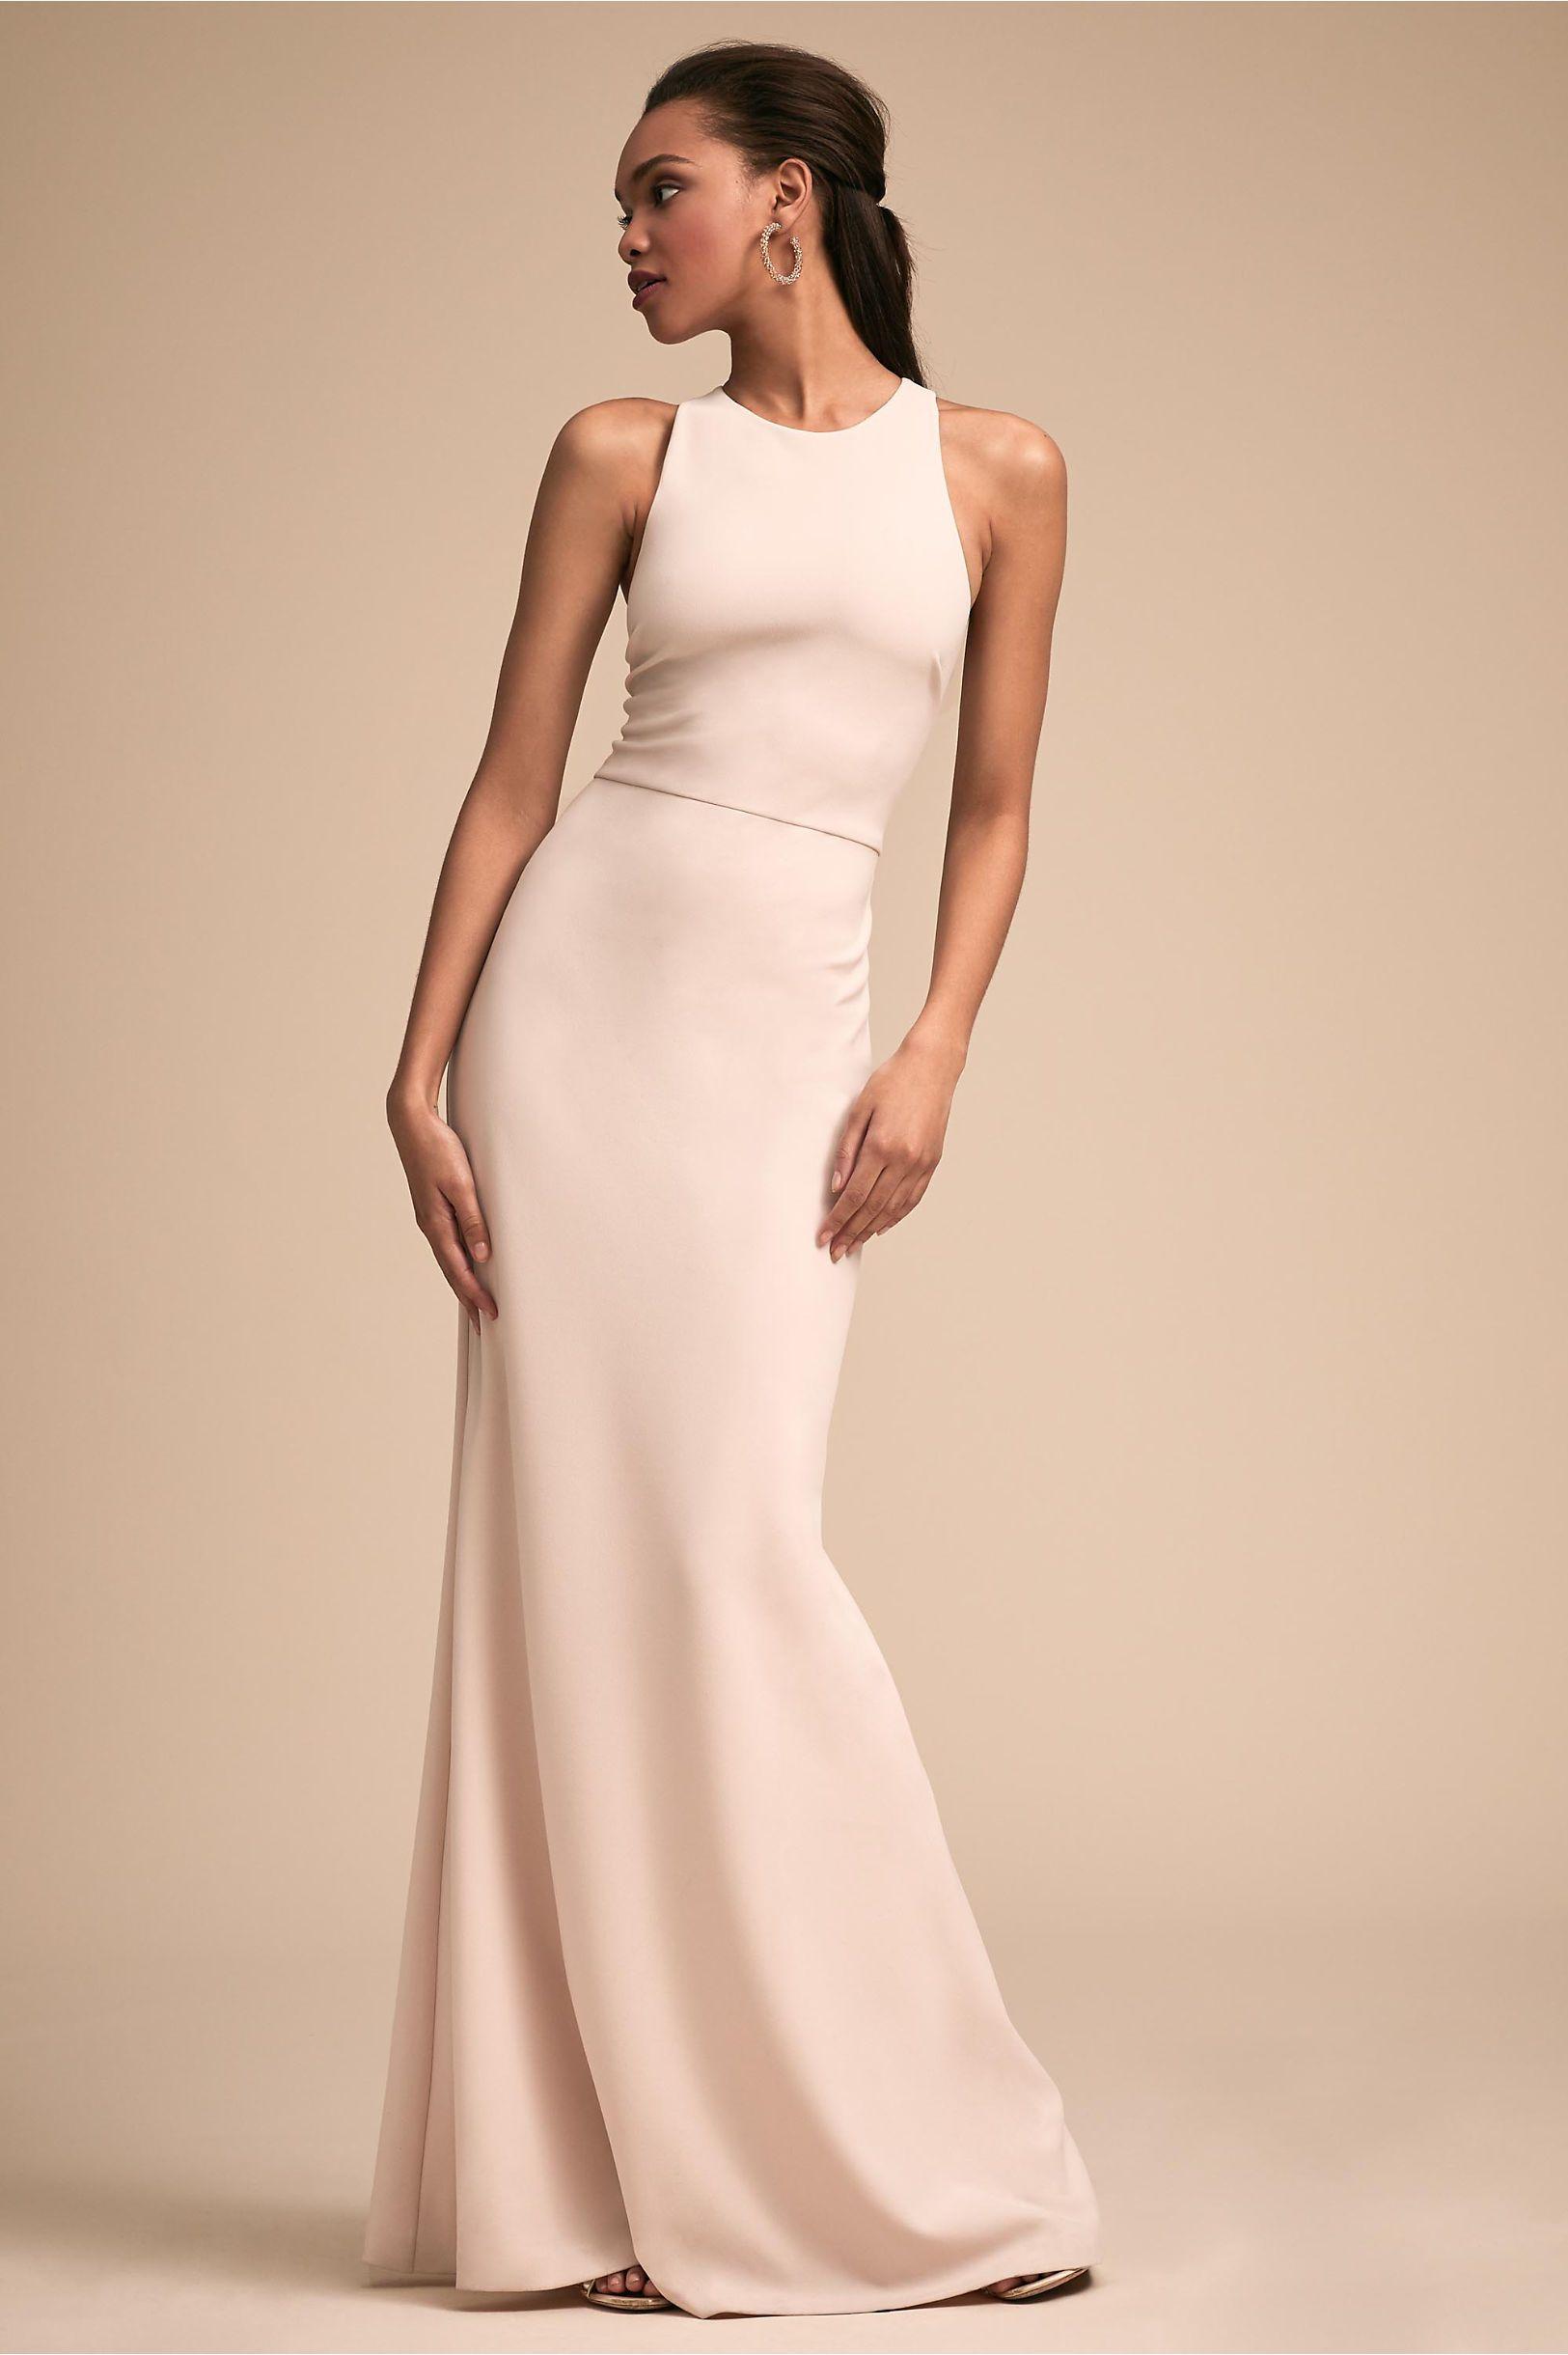 6c50852447 Klara Dress Midnight in Occasion Dresses